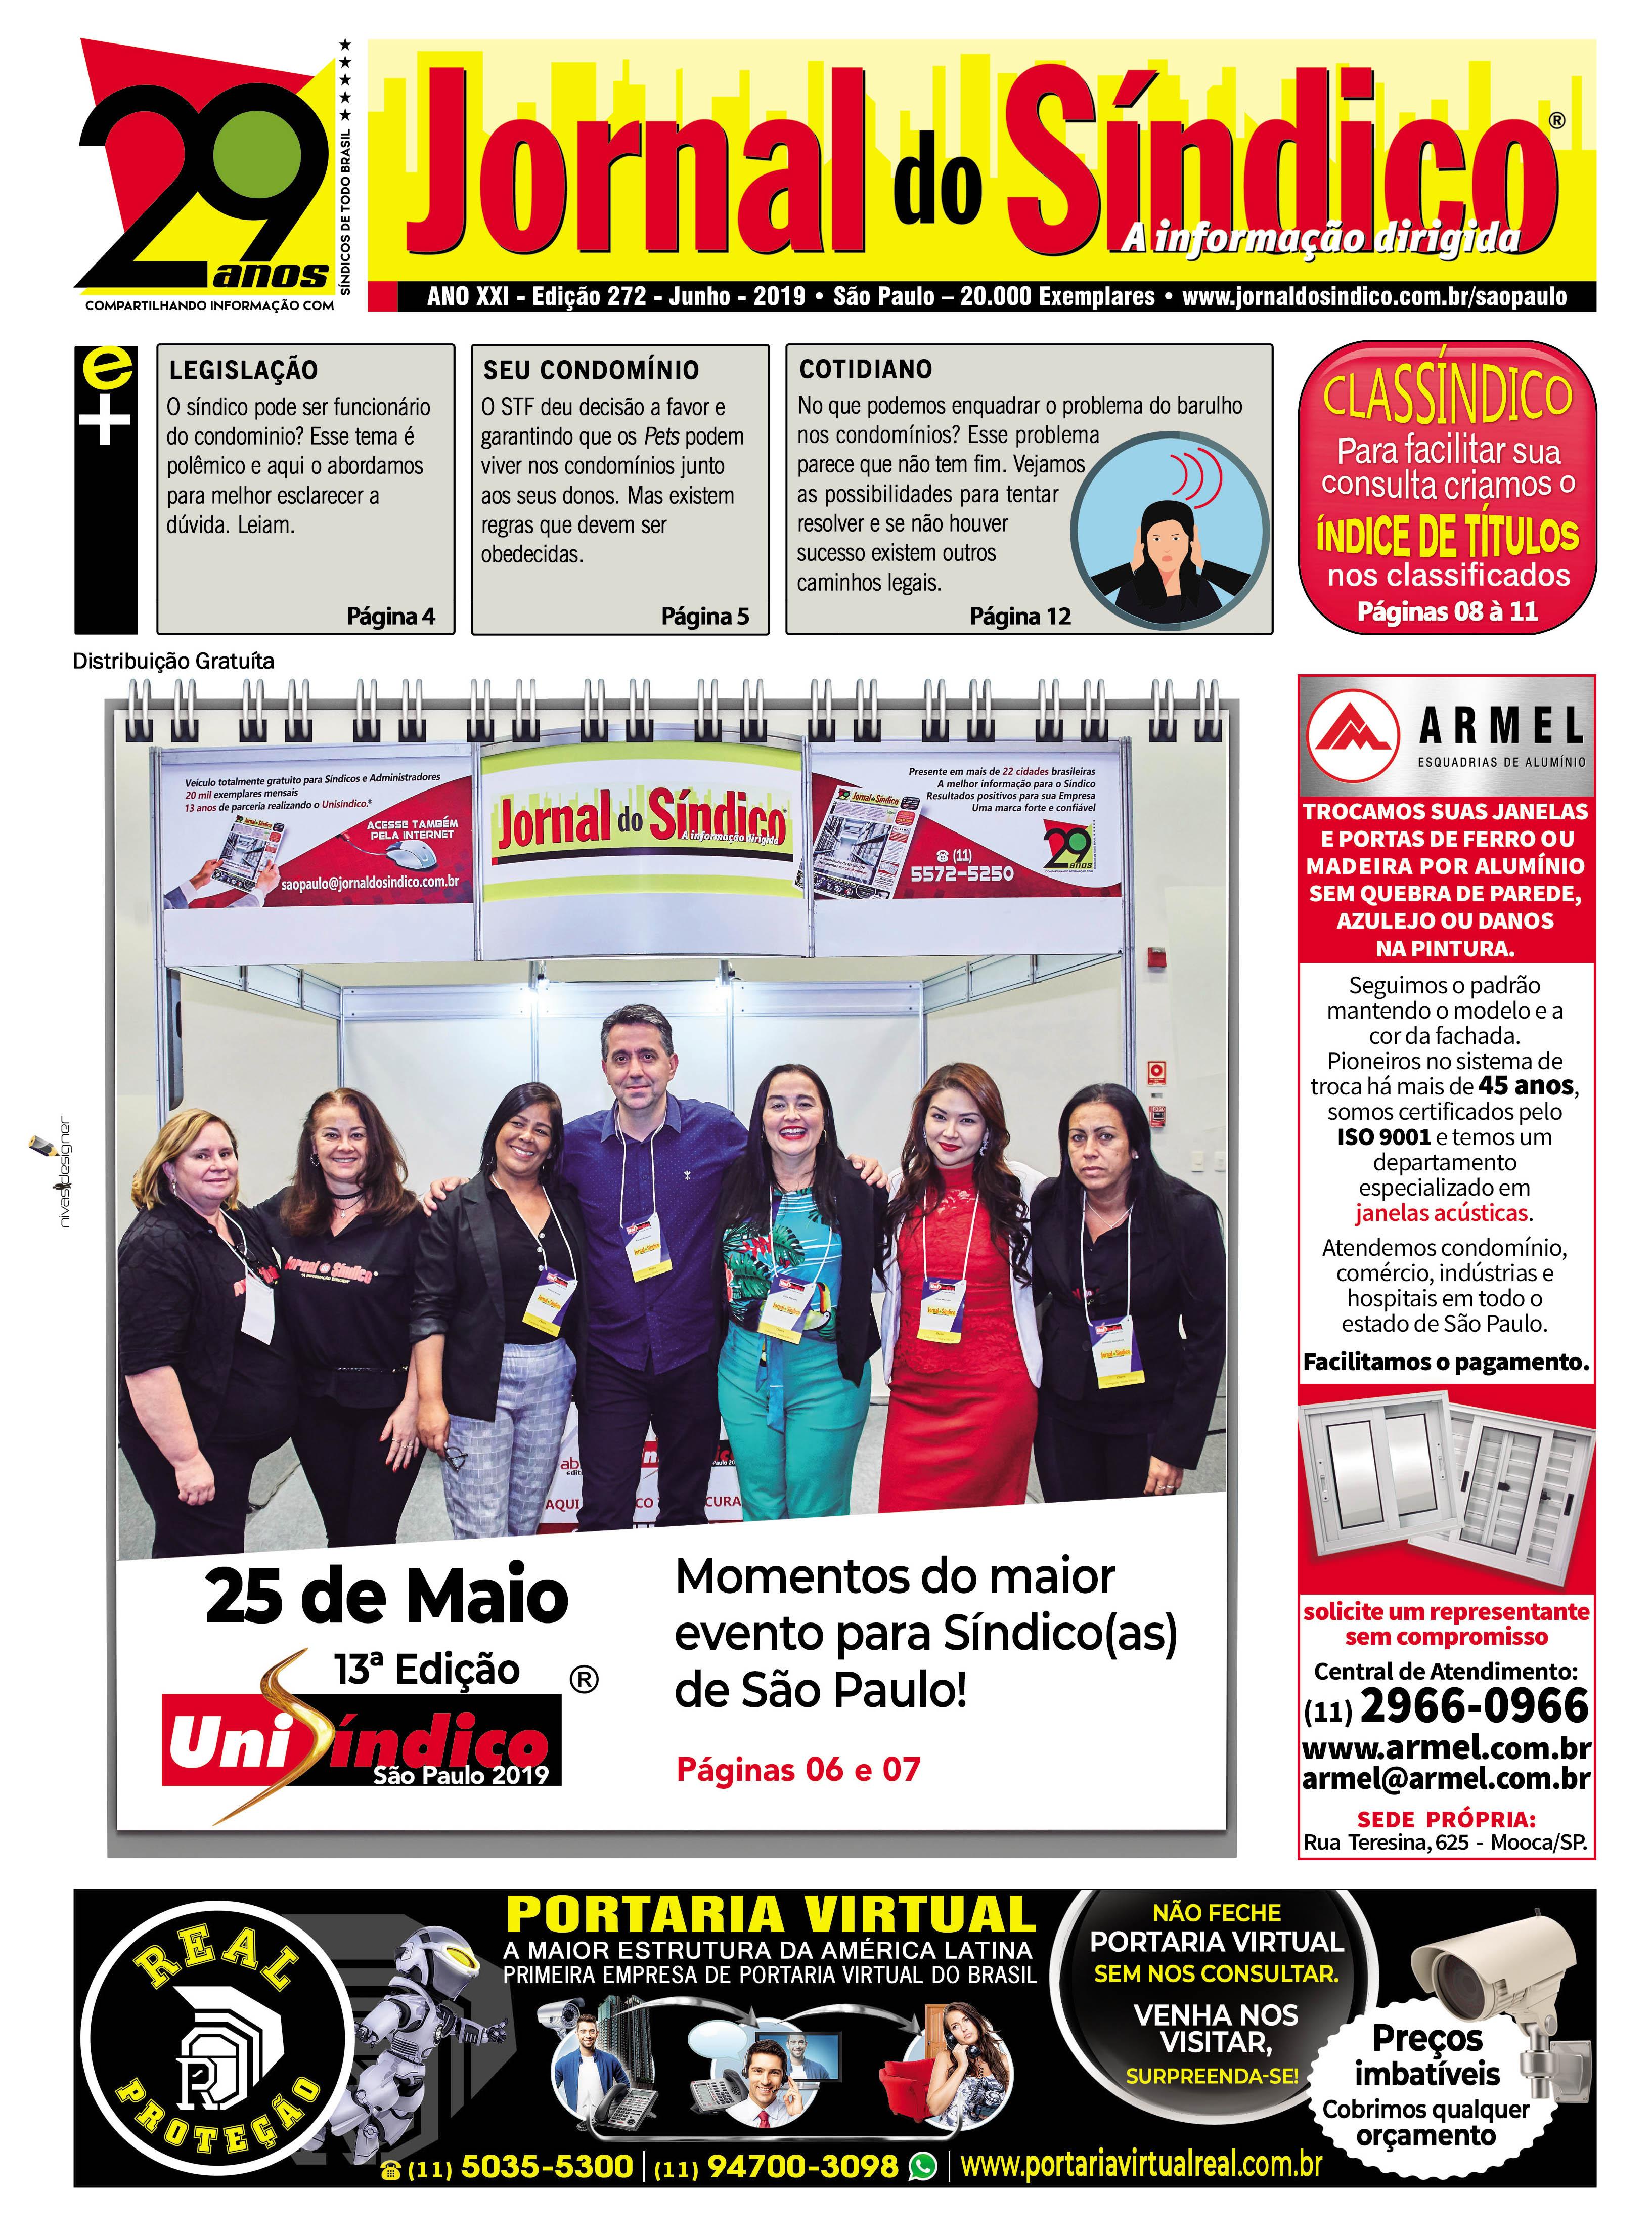 Jornal-Ediç 272 Junho 2019 - Bckp.indd